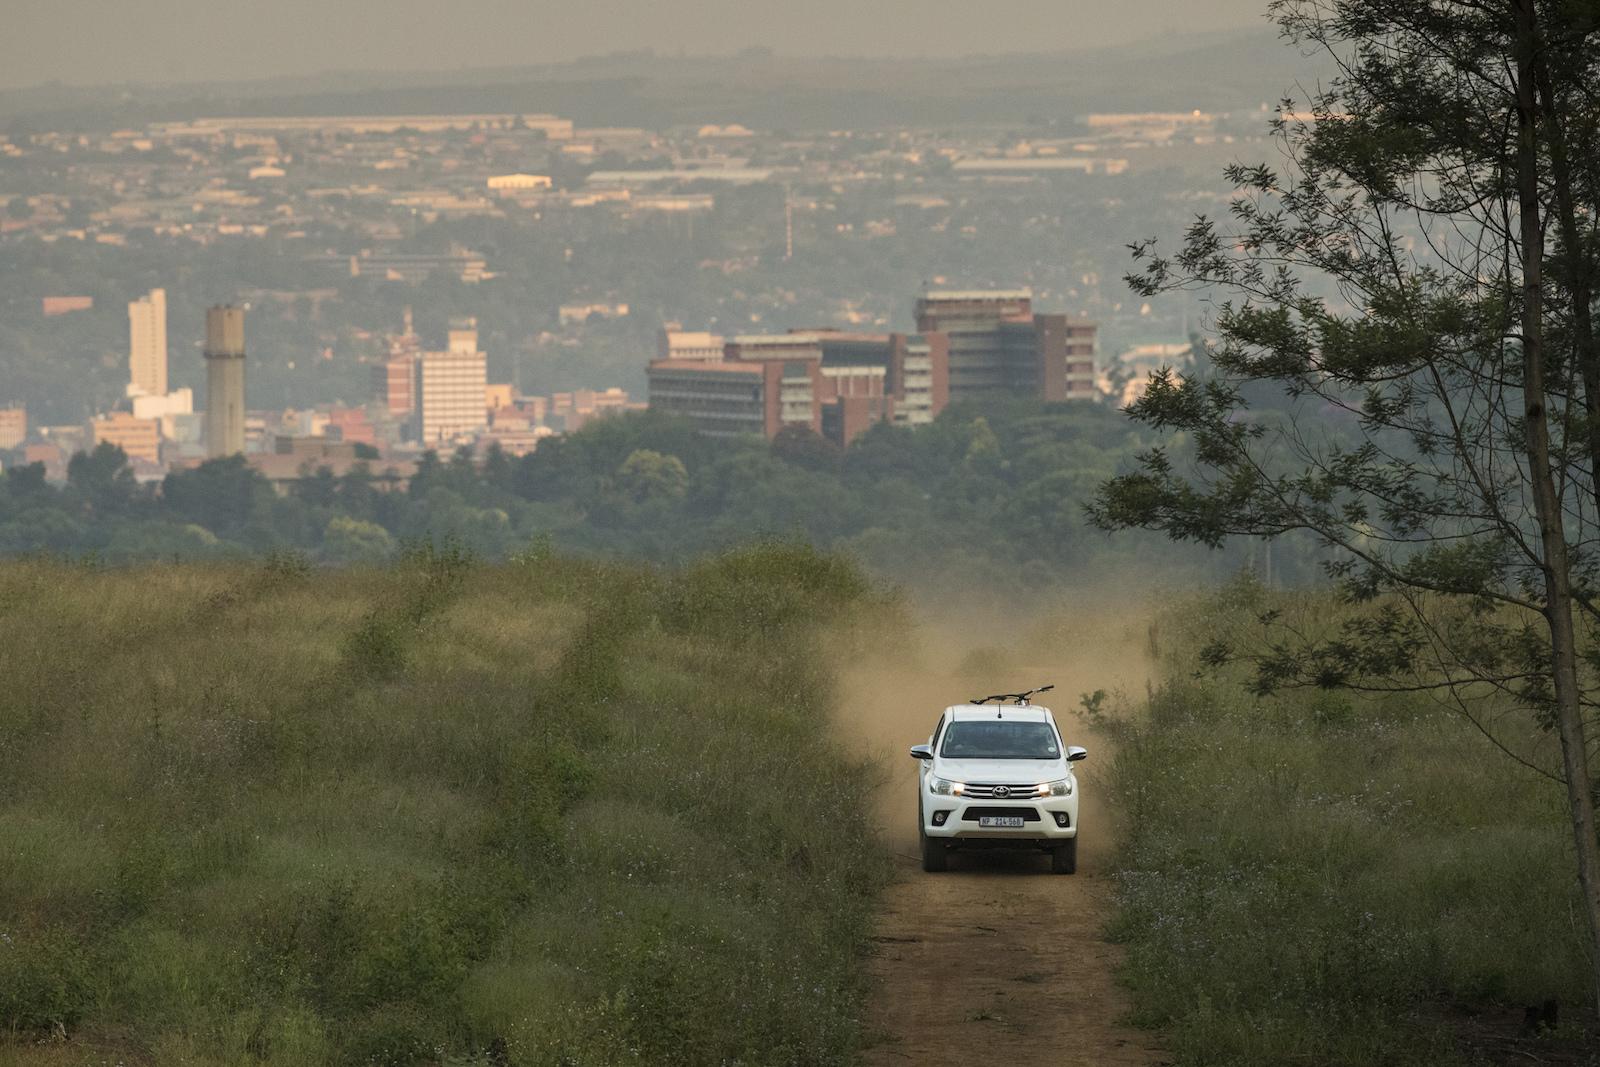 Greg Minnaar at home in Pietermaritzburg South Africa